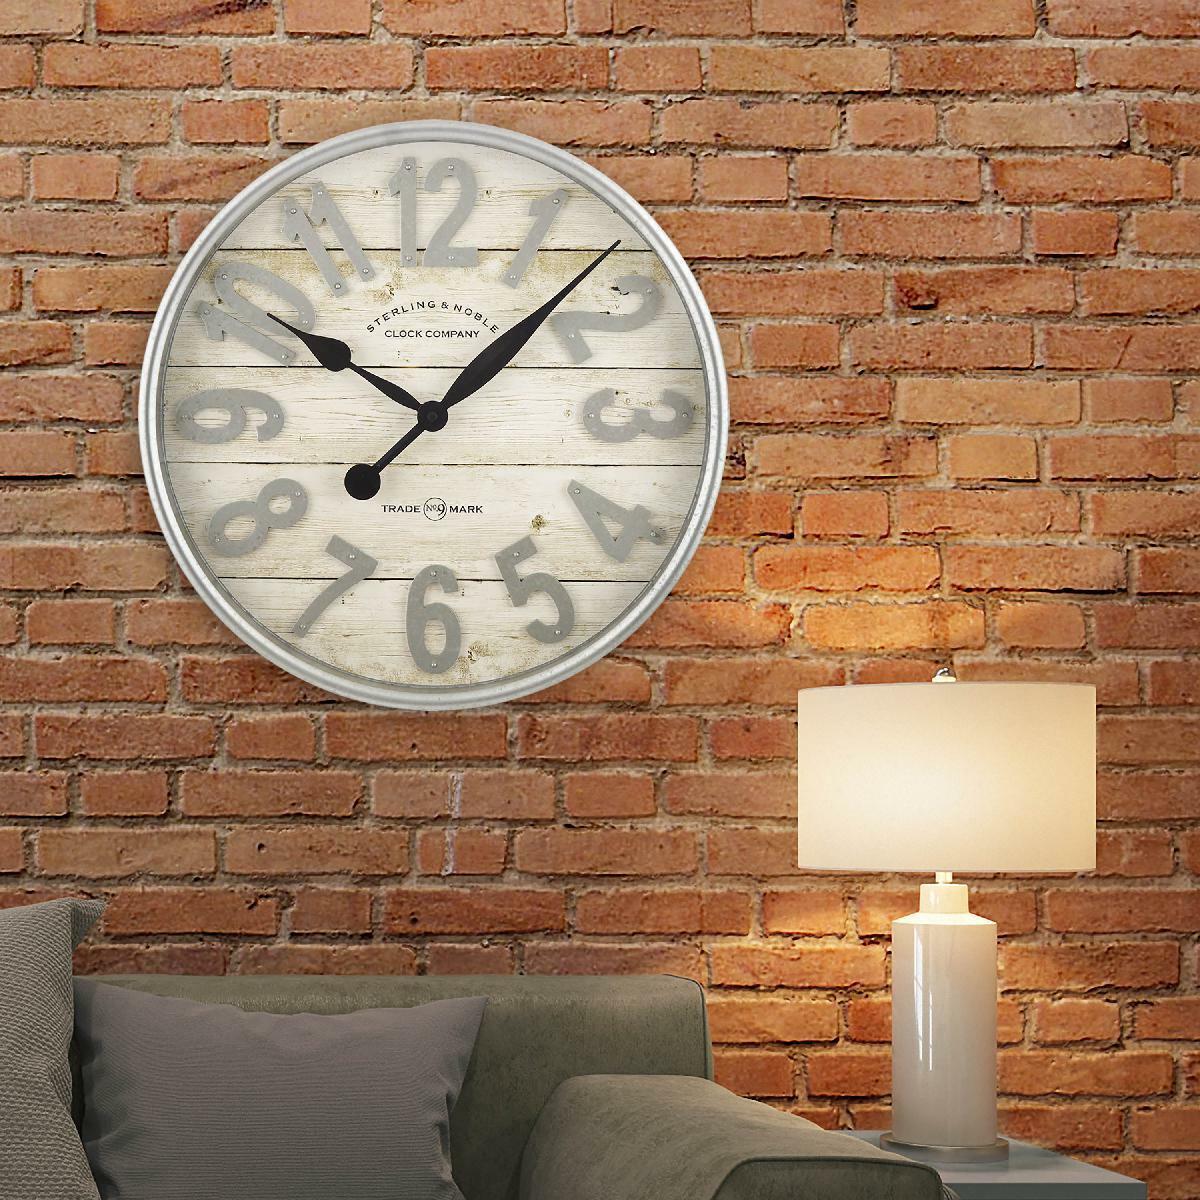 Round Galvanized Wall 27 Clock The Grand Hotel Paris Silver White Brand For Sale Online Ebay